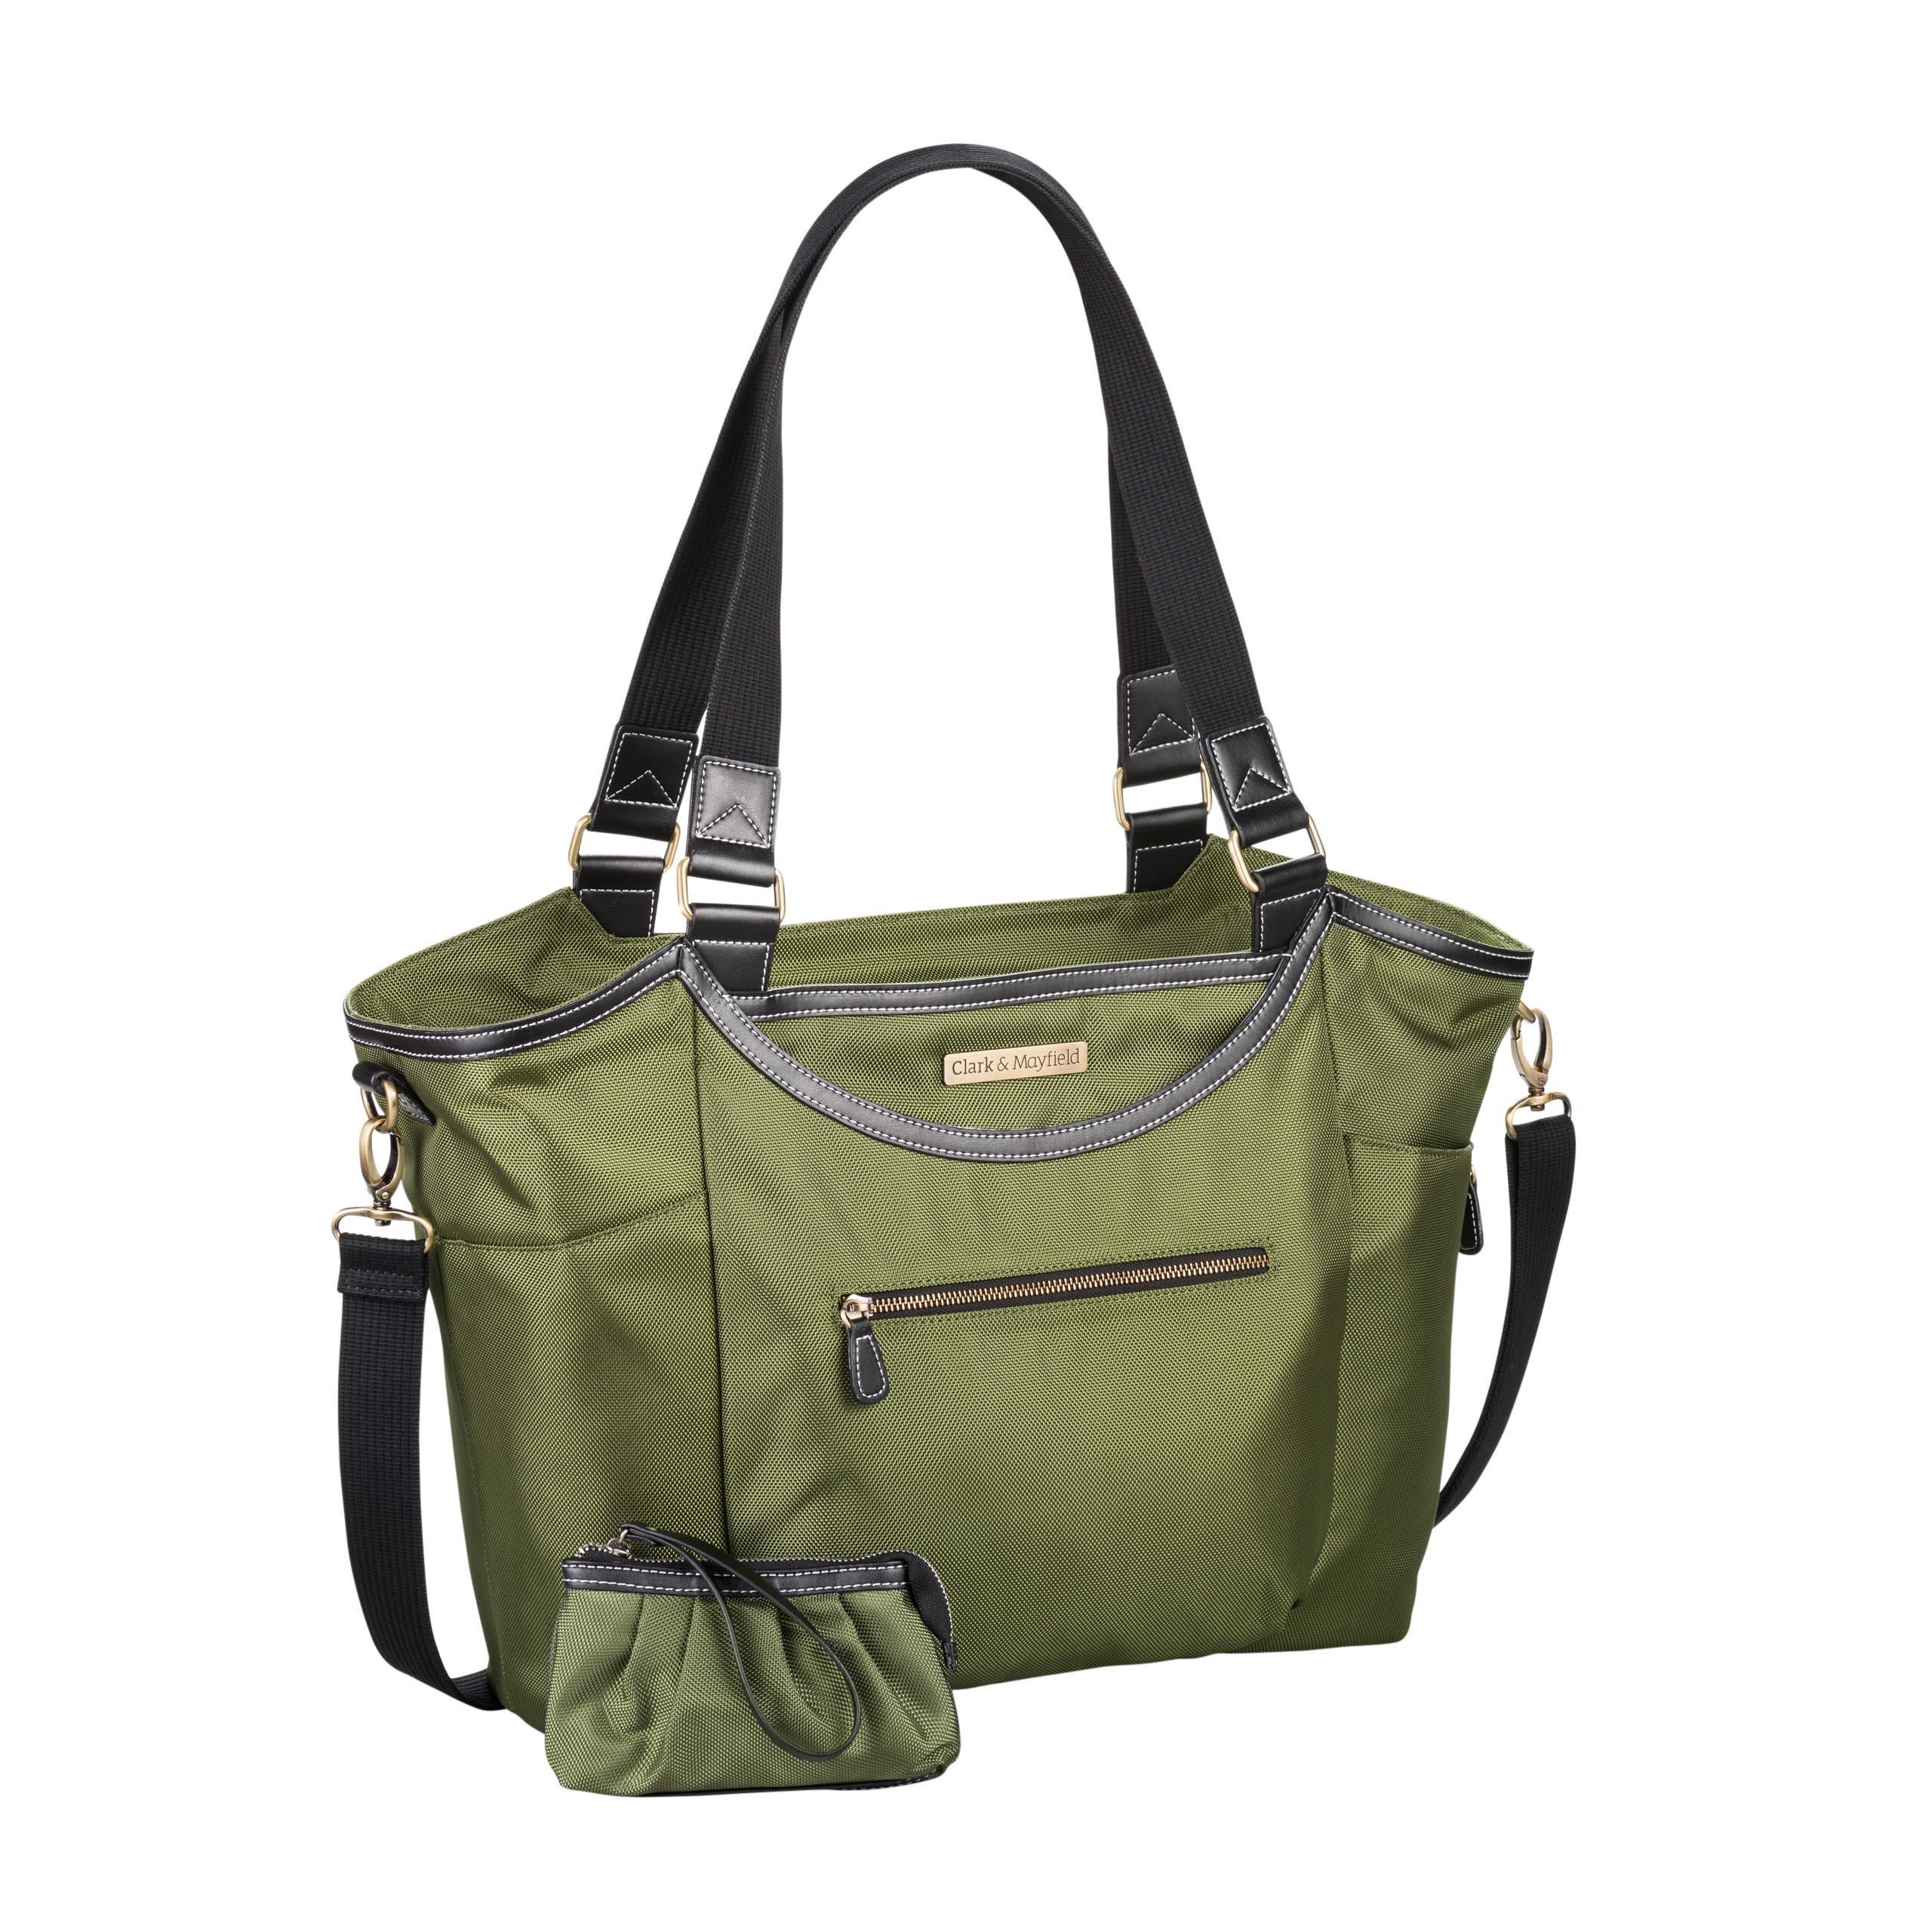 Clark & Mayfield Women's Bellevue Laptop Handbag (Fits laptops up to 18.4'', Pesto Green)